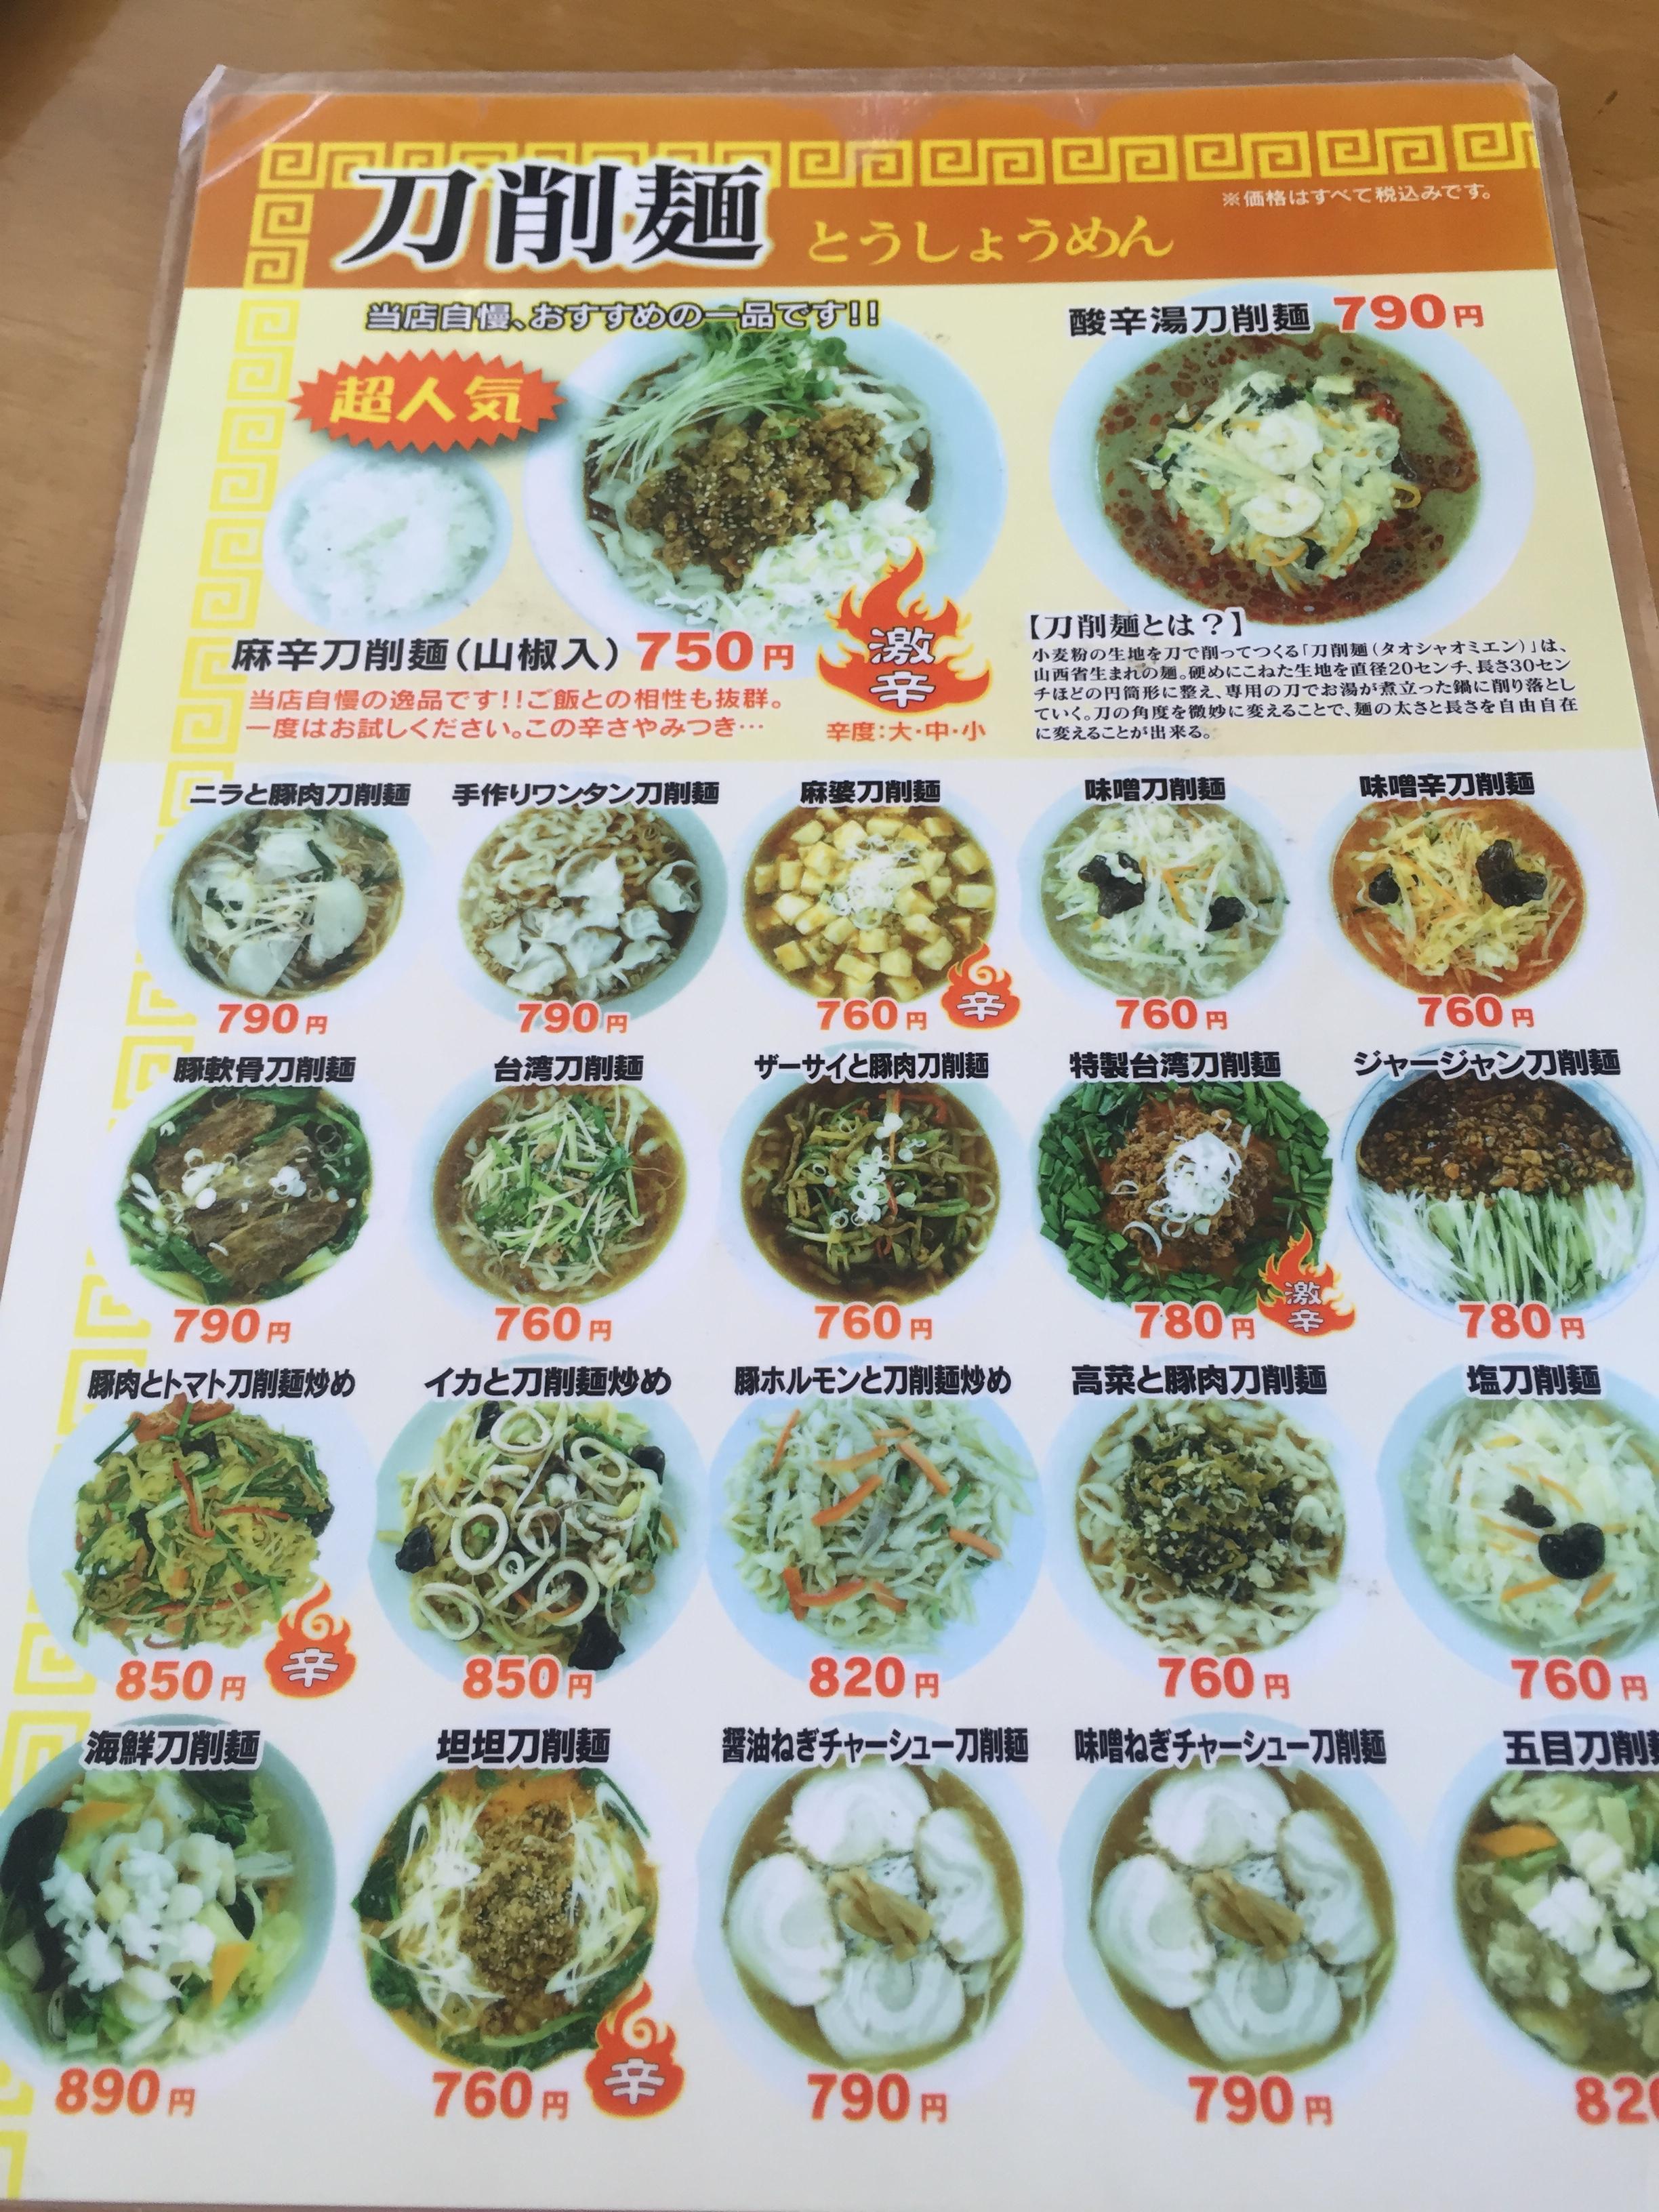 西安刀削麺 大河原店 メニュー1